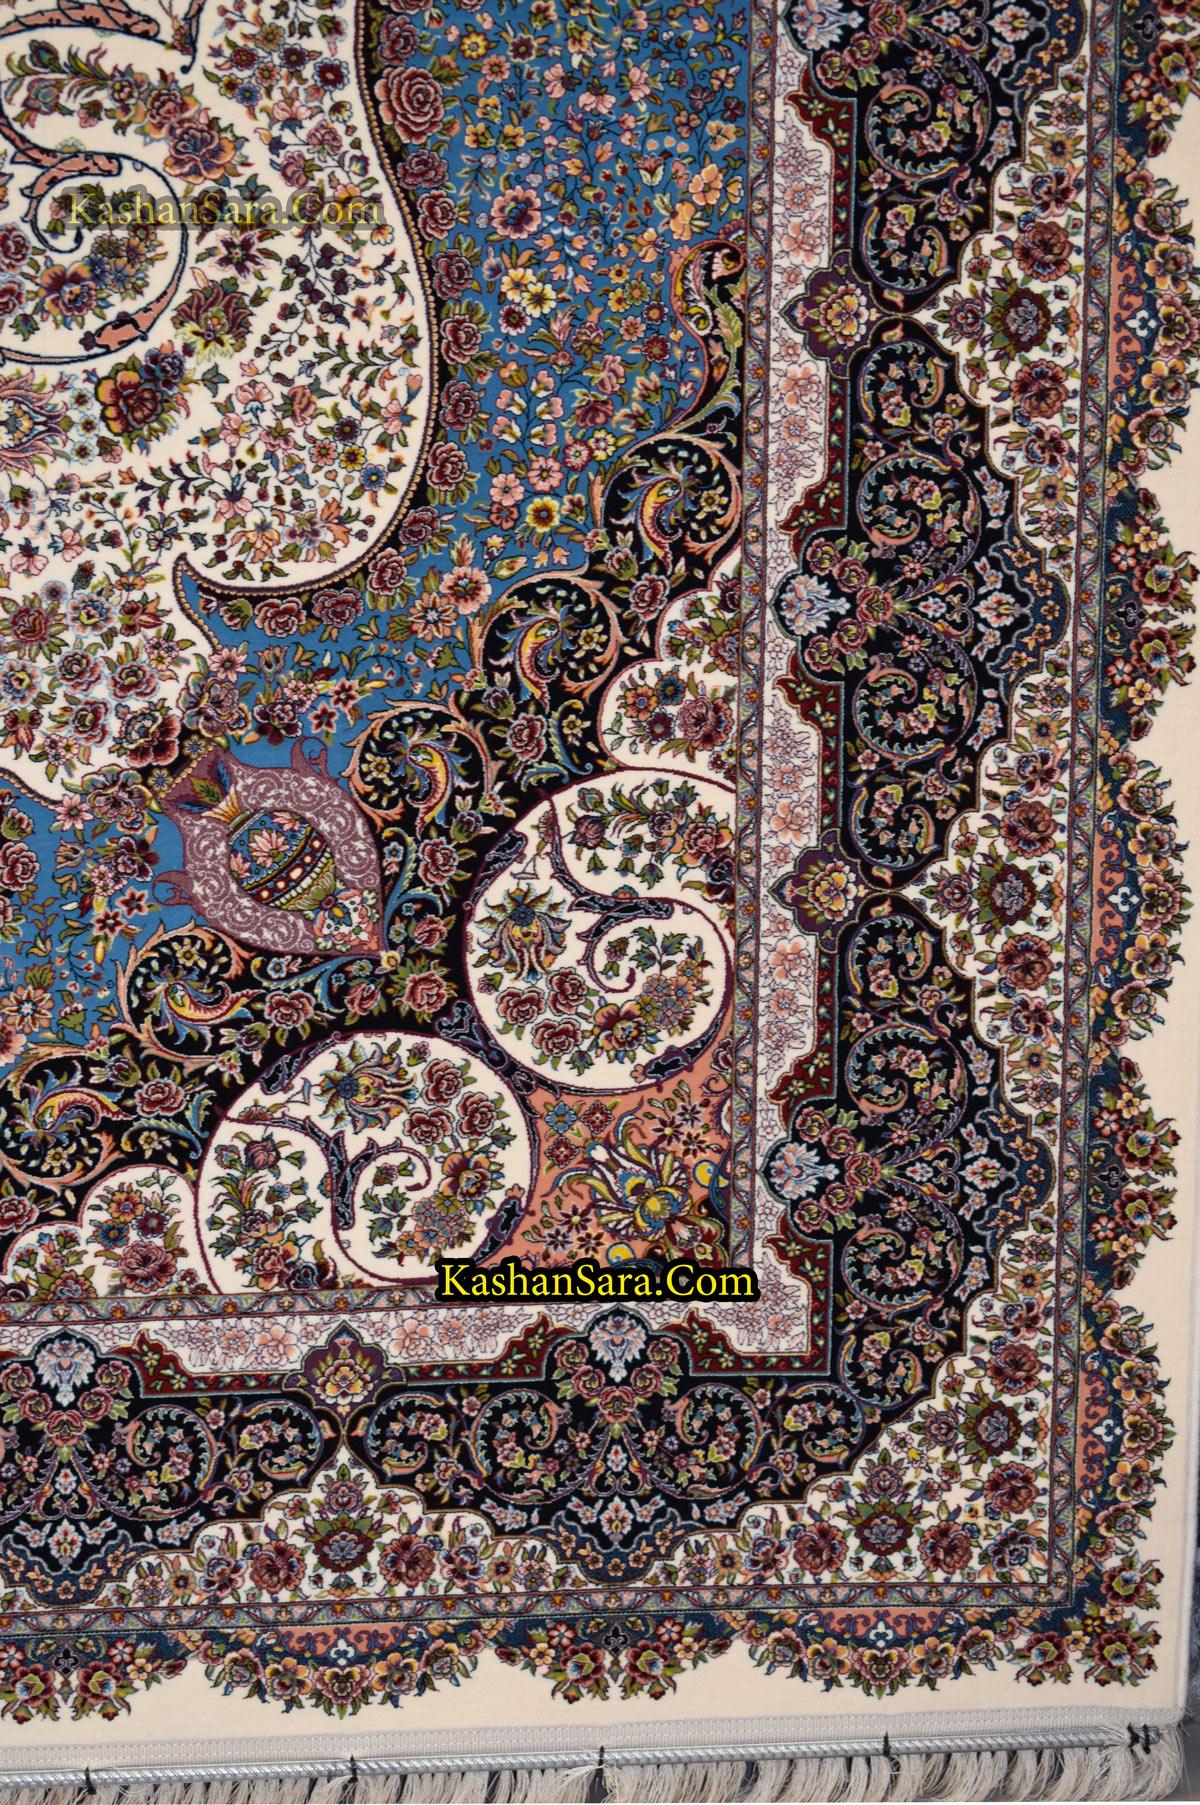 قیمت فرش ۱۲۰۰ شانه ماشینی کاشان طرح صوفیا